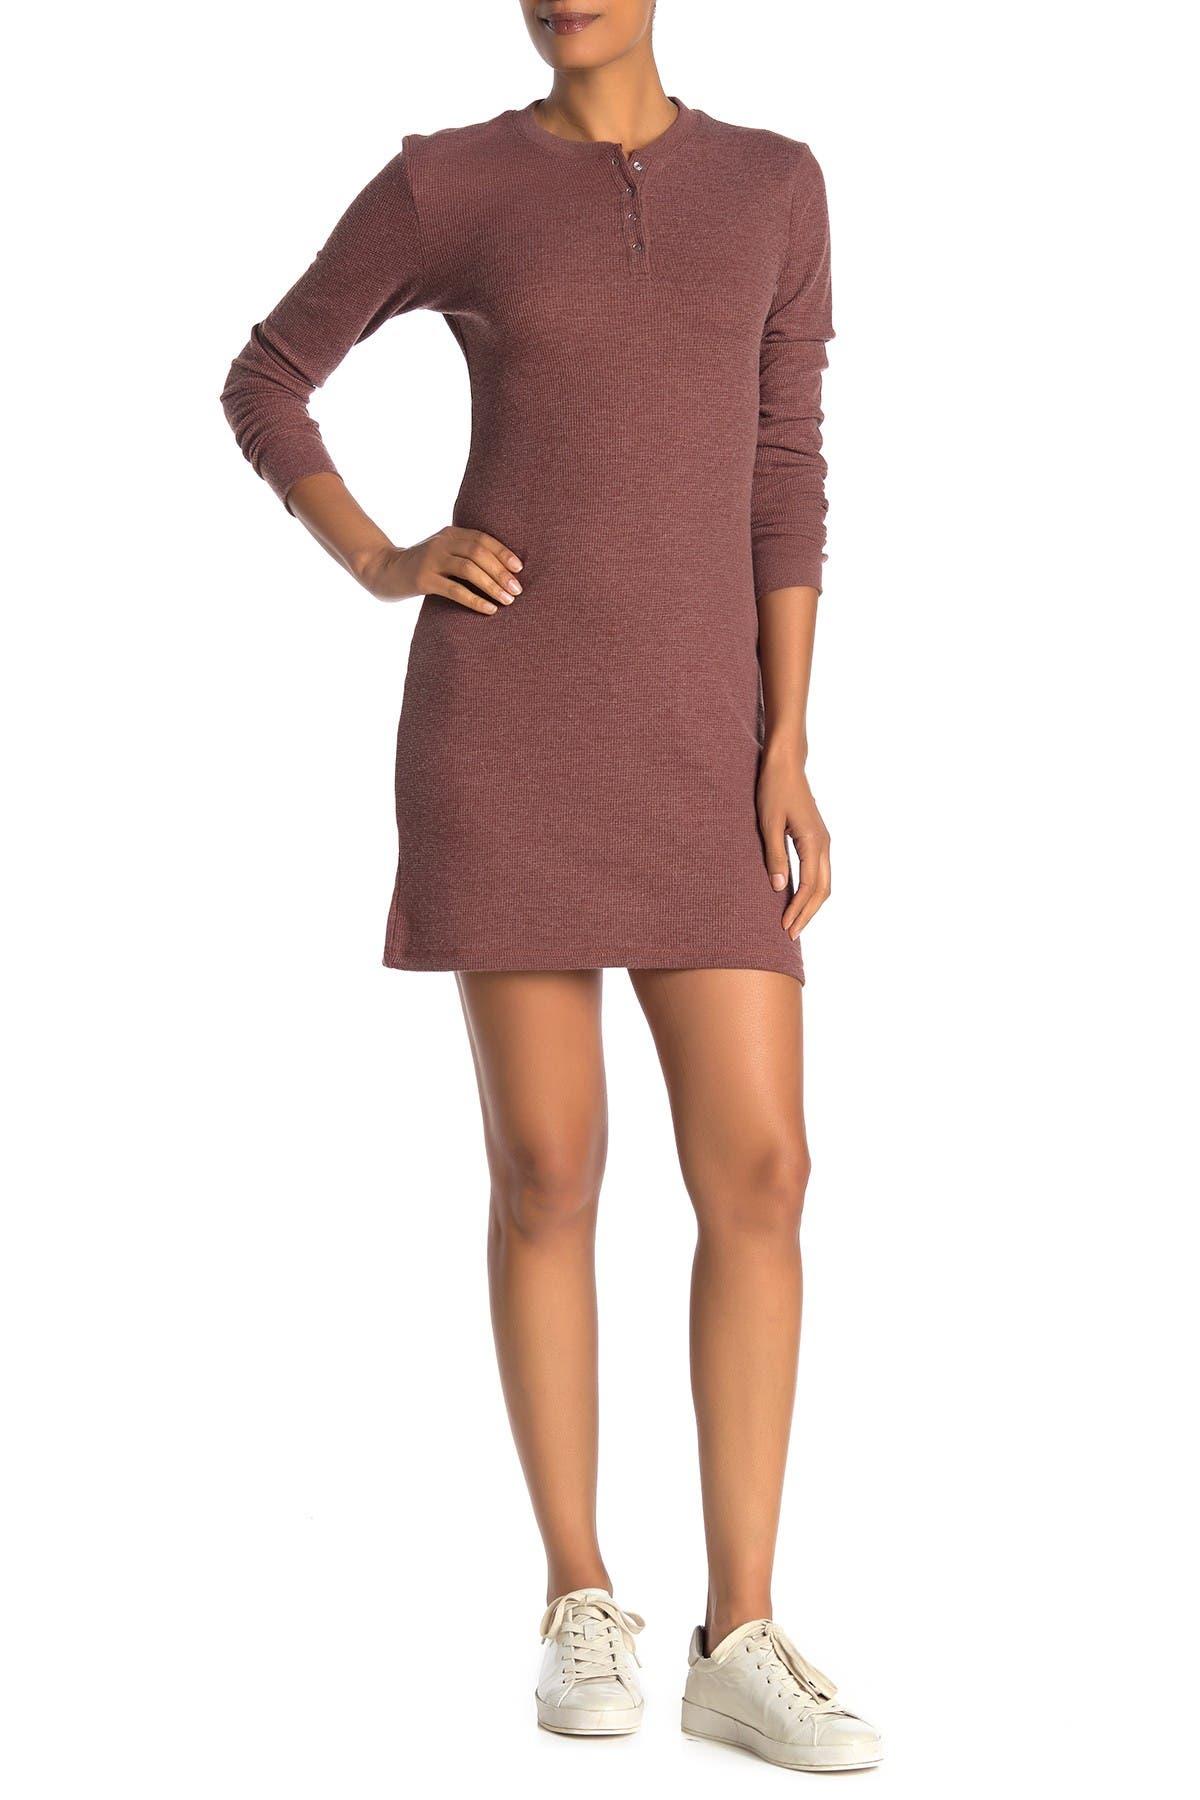 Image of Alternative Thermal Long Sleeve Henley Dress